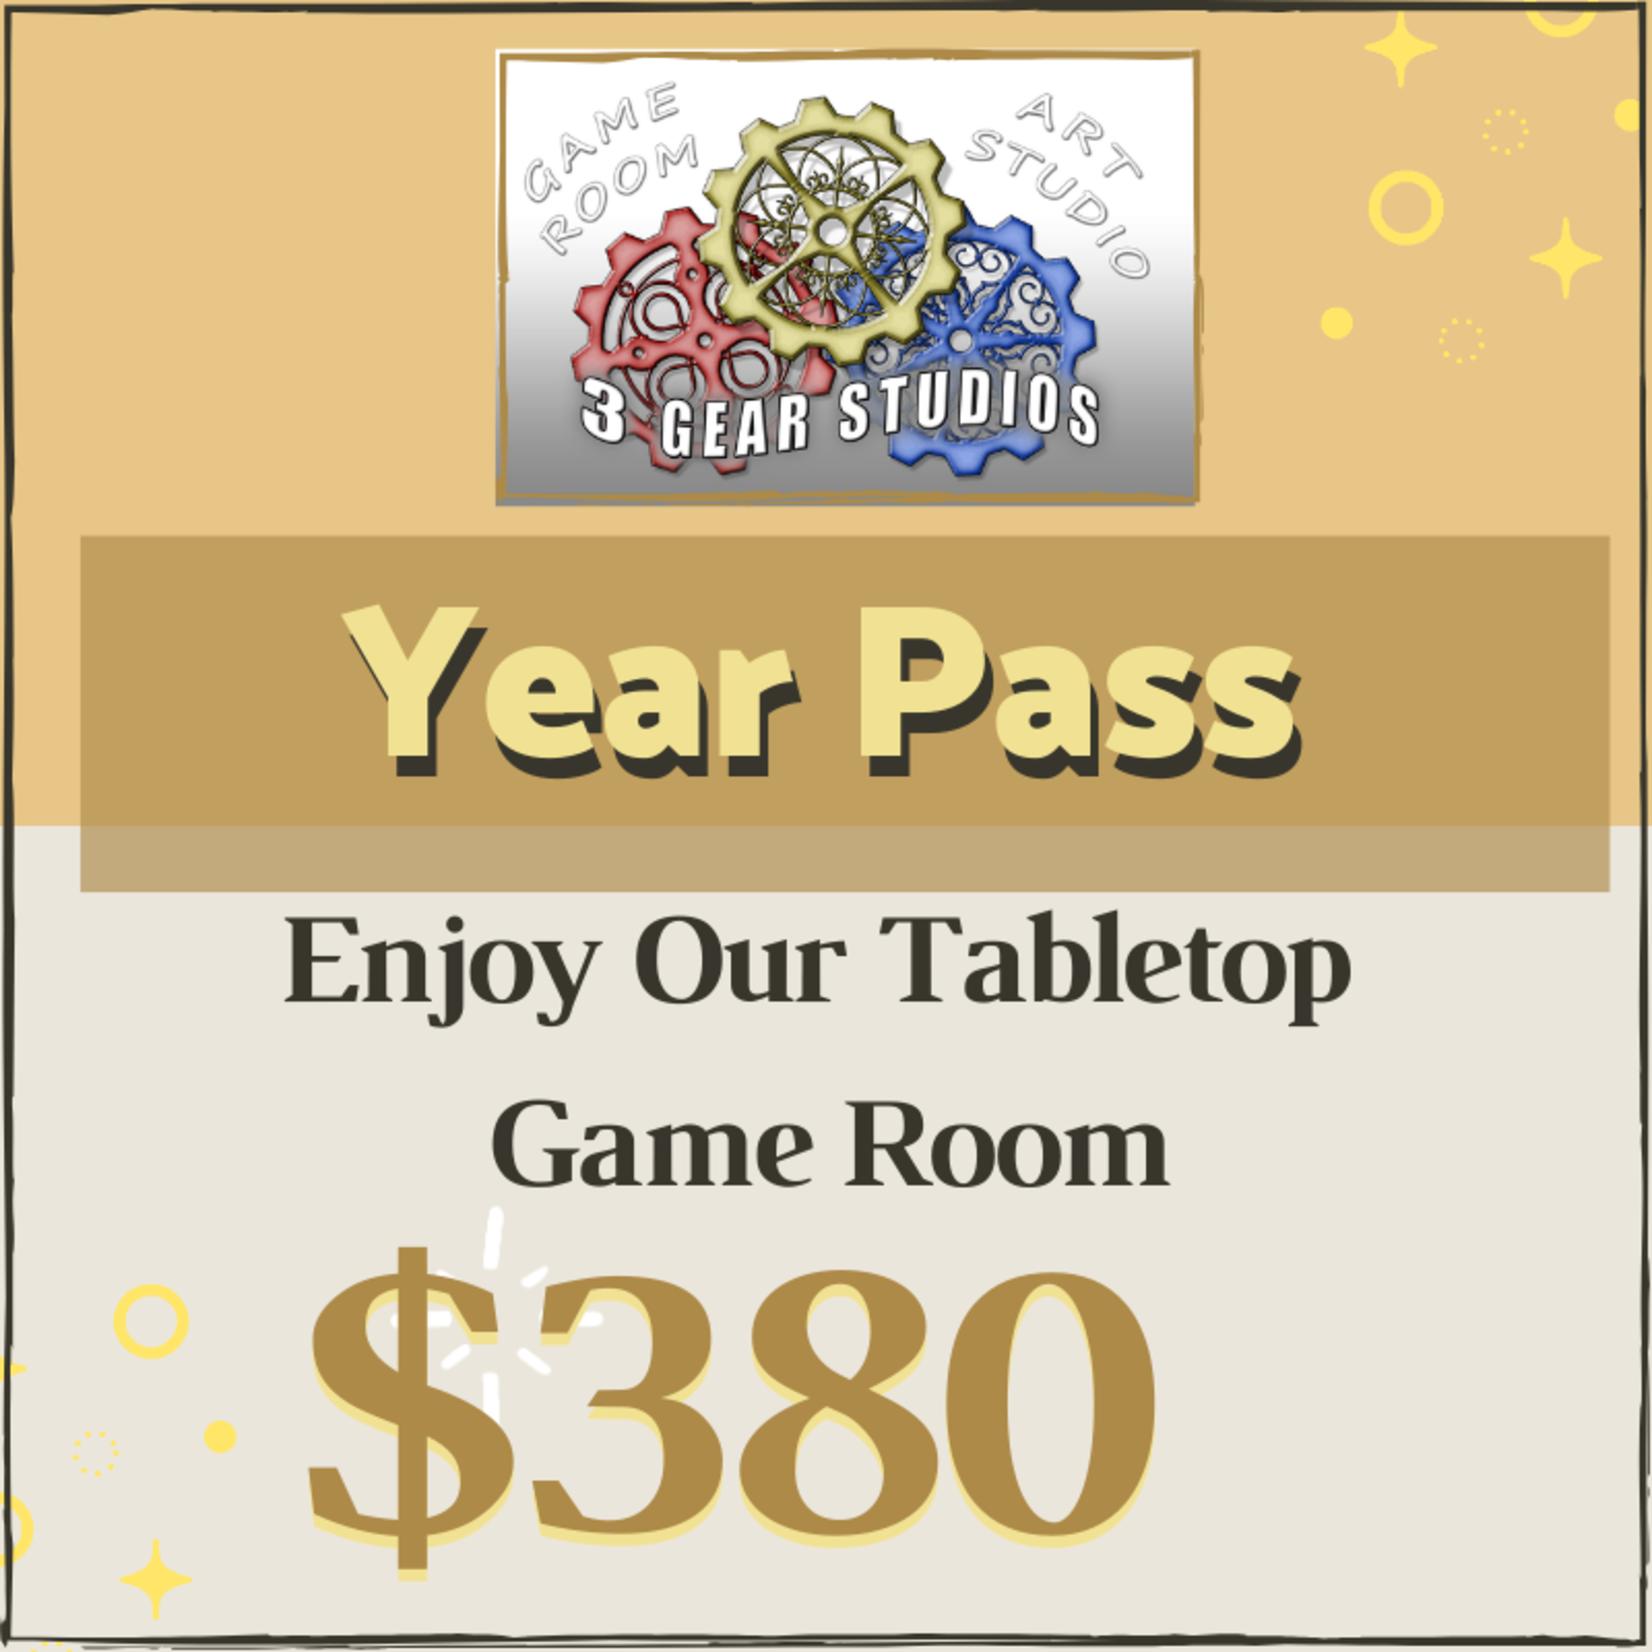 Game Room: Year Pass